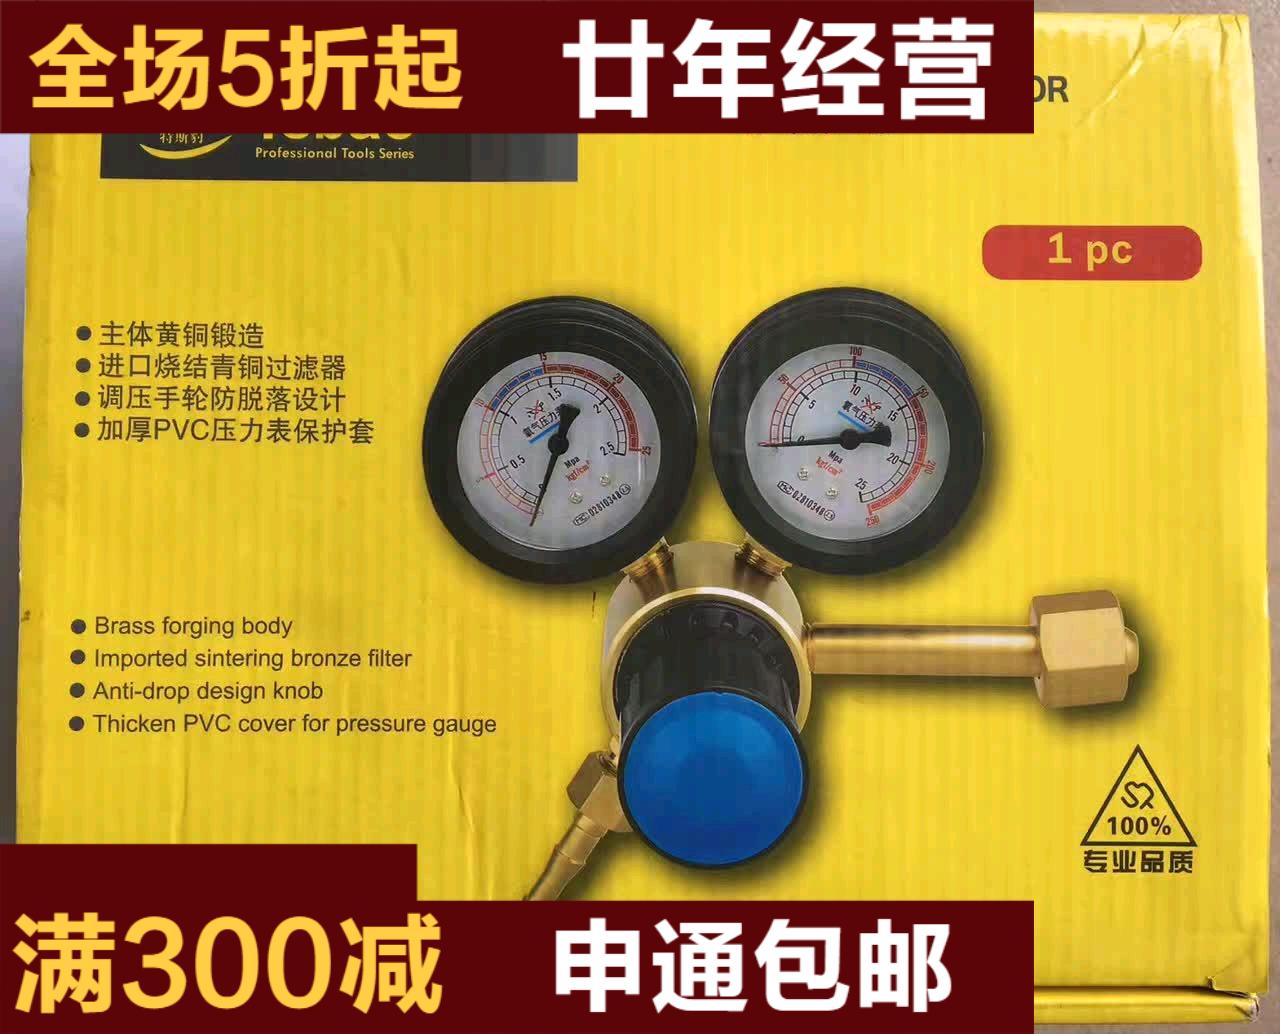 New type of all copper oxygen pressure reducing valve, acetylene surface oxygen cylinder, pressure reducer, welding accessories, pressure meter, mail